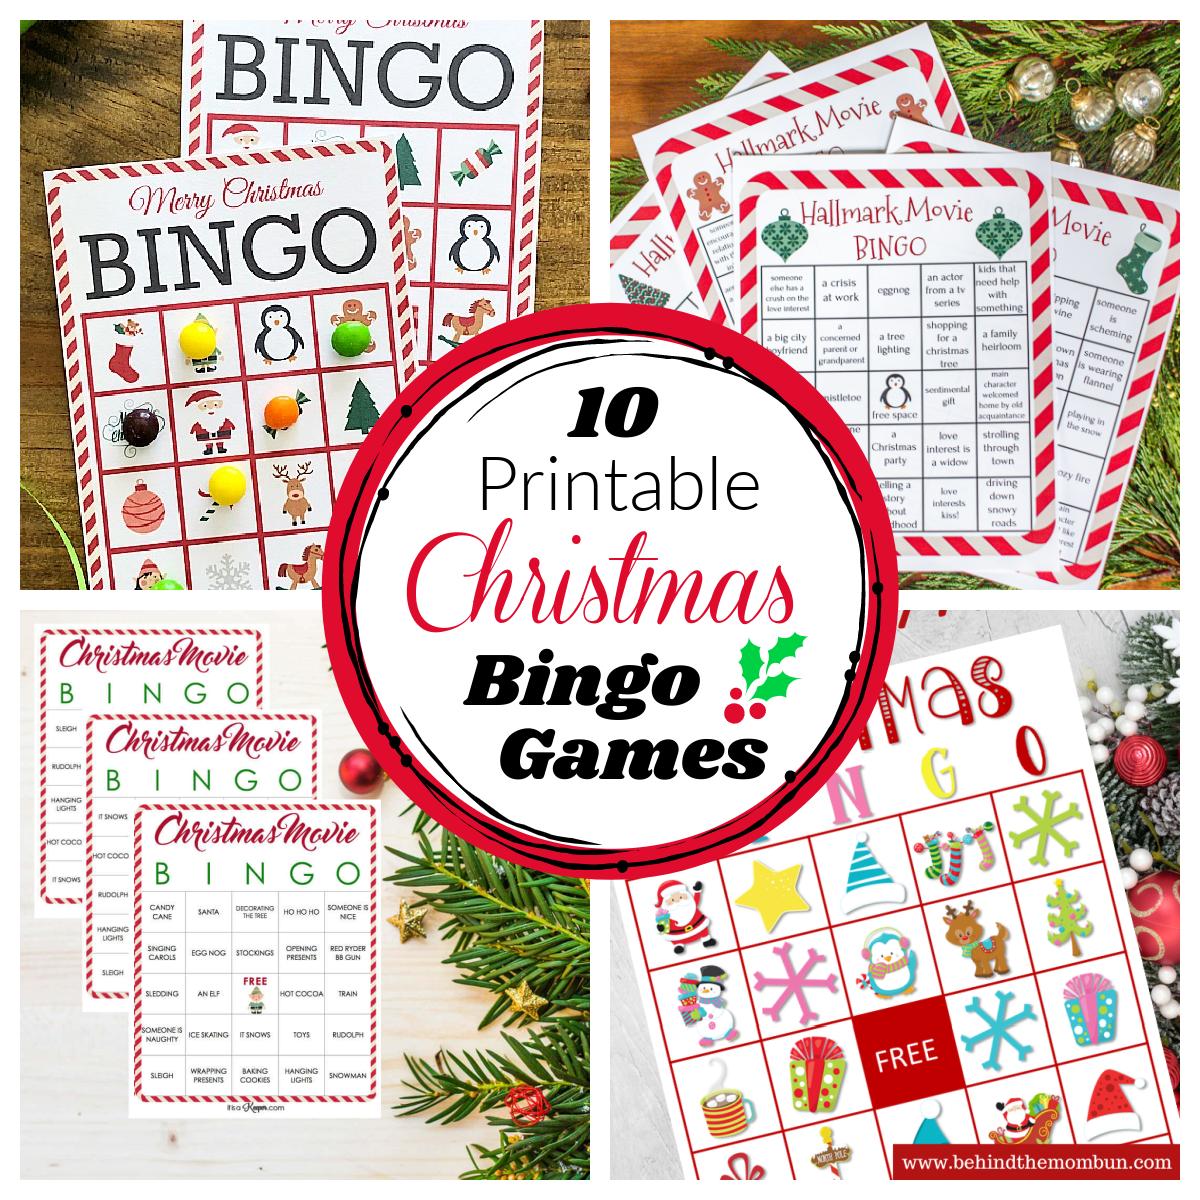 10 Free Printable Christmas Bingo Games Fun Squared